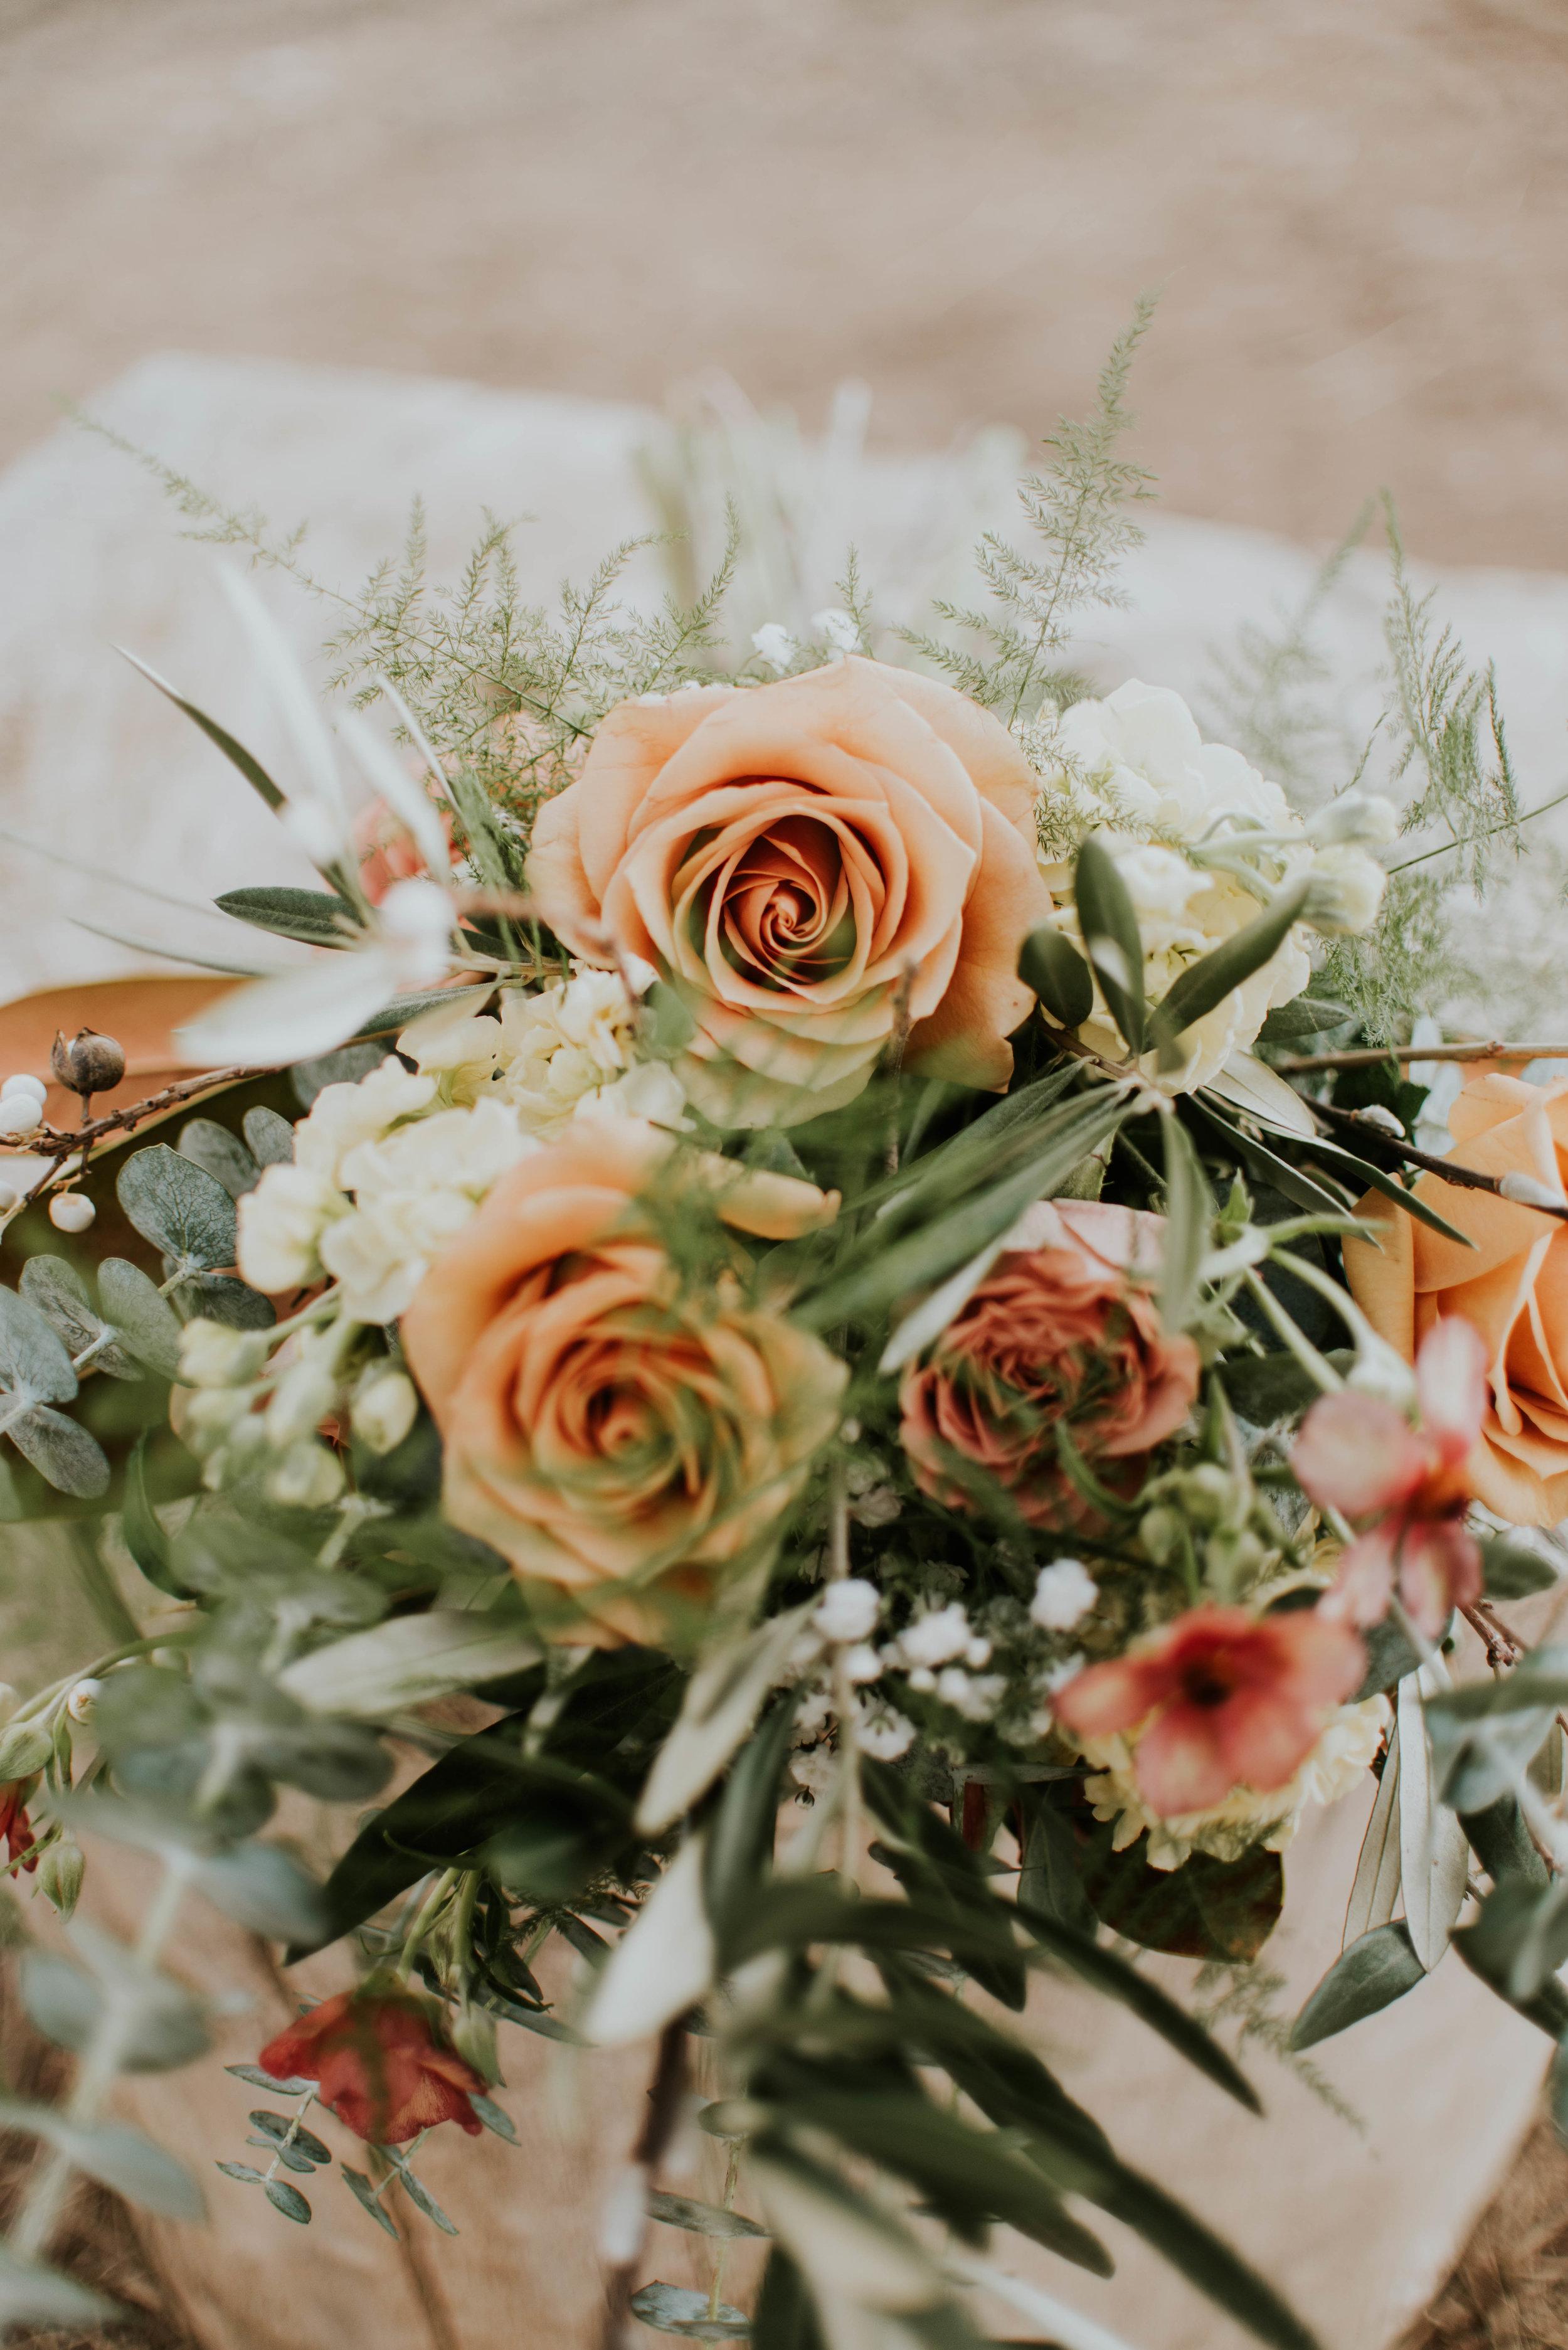 Colorado Wedding Photographer | Miss. Miller's Photography | American Mustang Horses | Country Wedding | Buckskin Bride | Colorado Wedding Venues